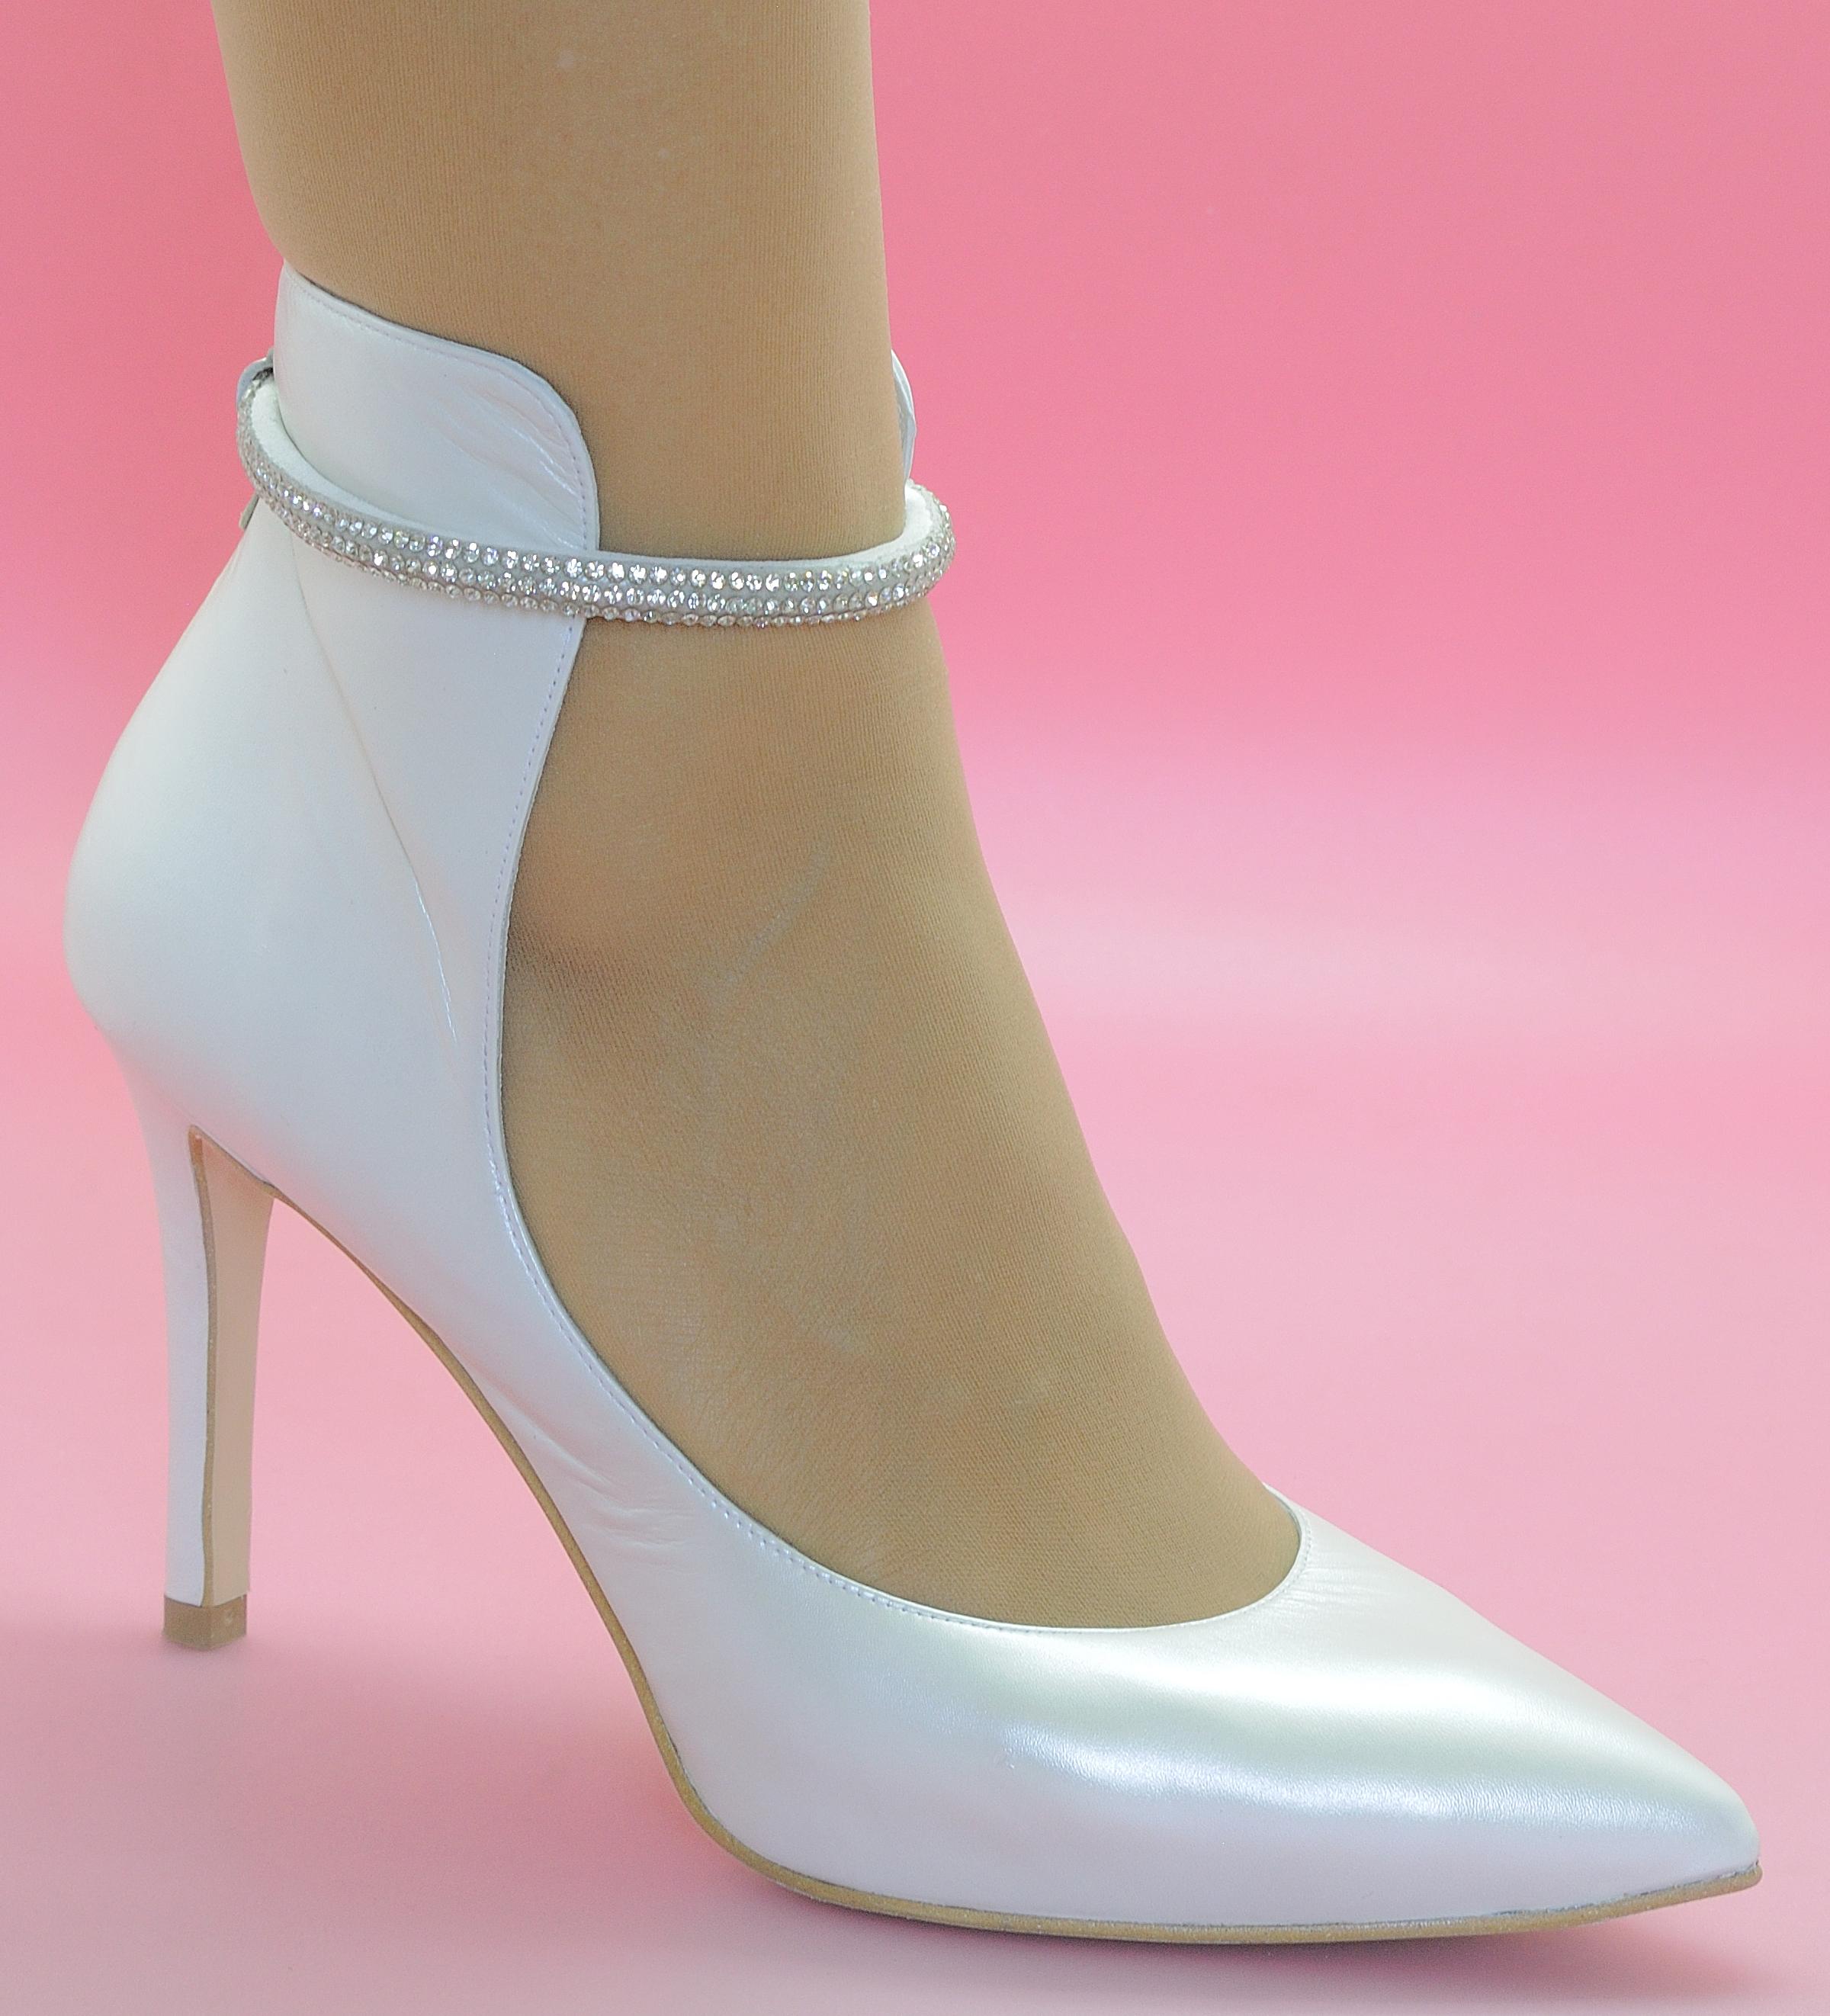 zapatos de salón de novia Archivos | enepe by neus peña